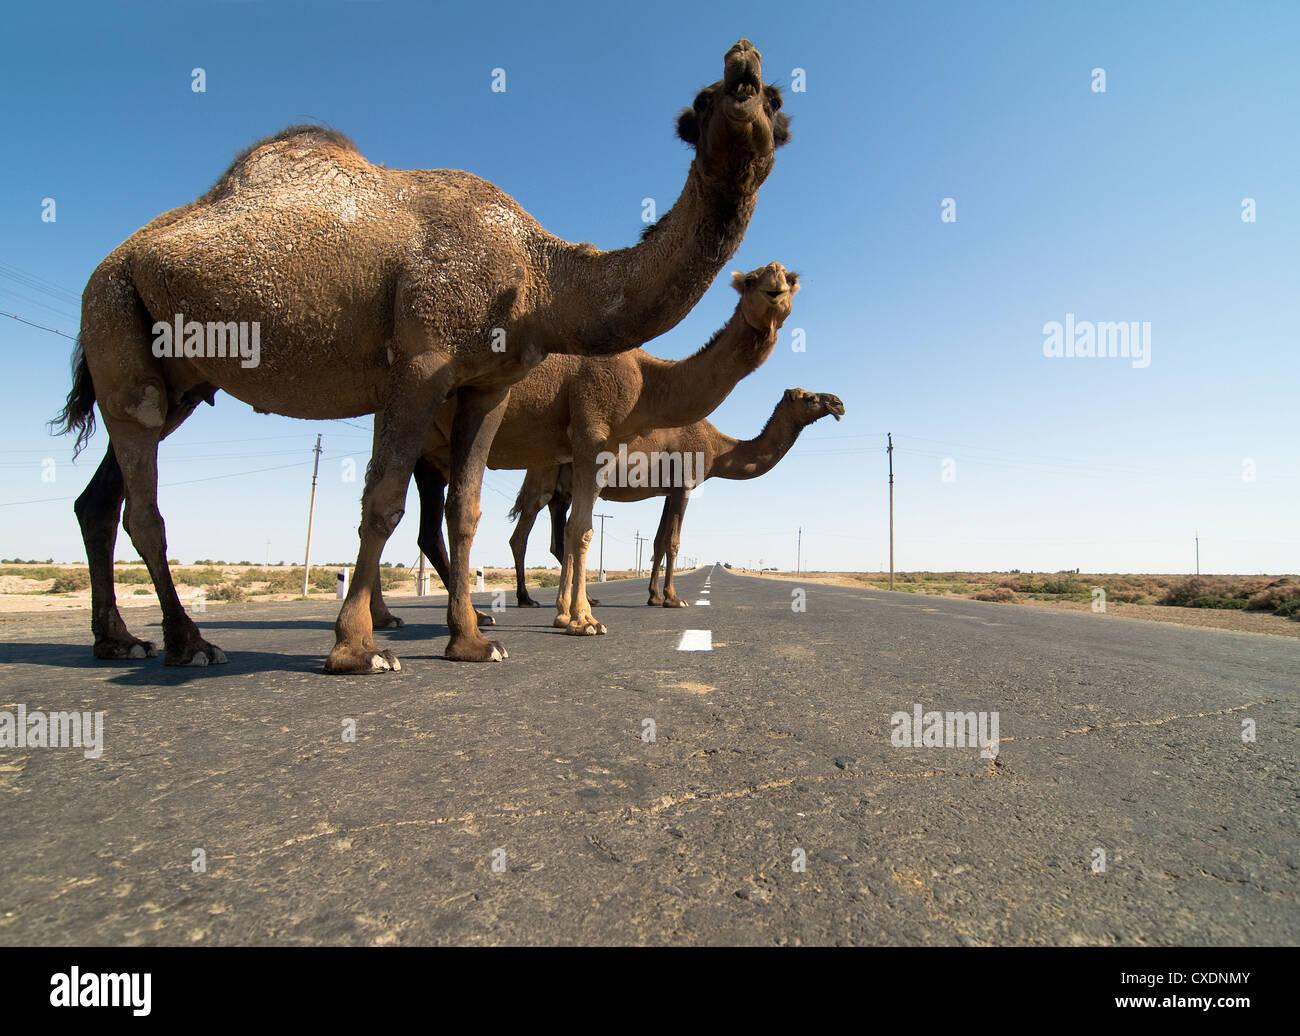 Camels standing on a desert road in Karakalpakstan, Uzbekistan. - Stock Image